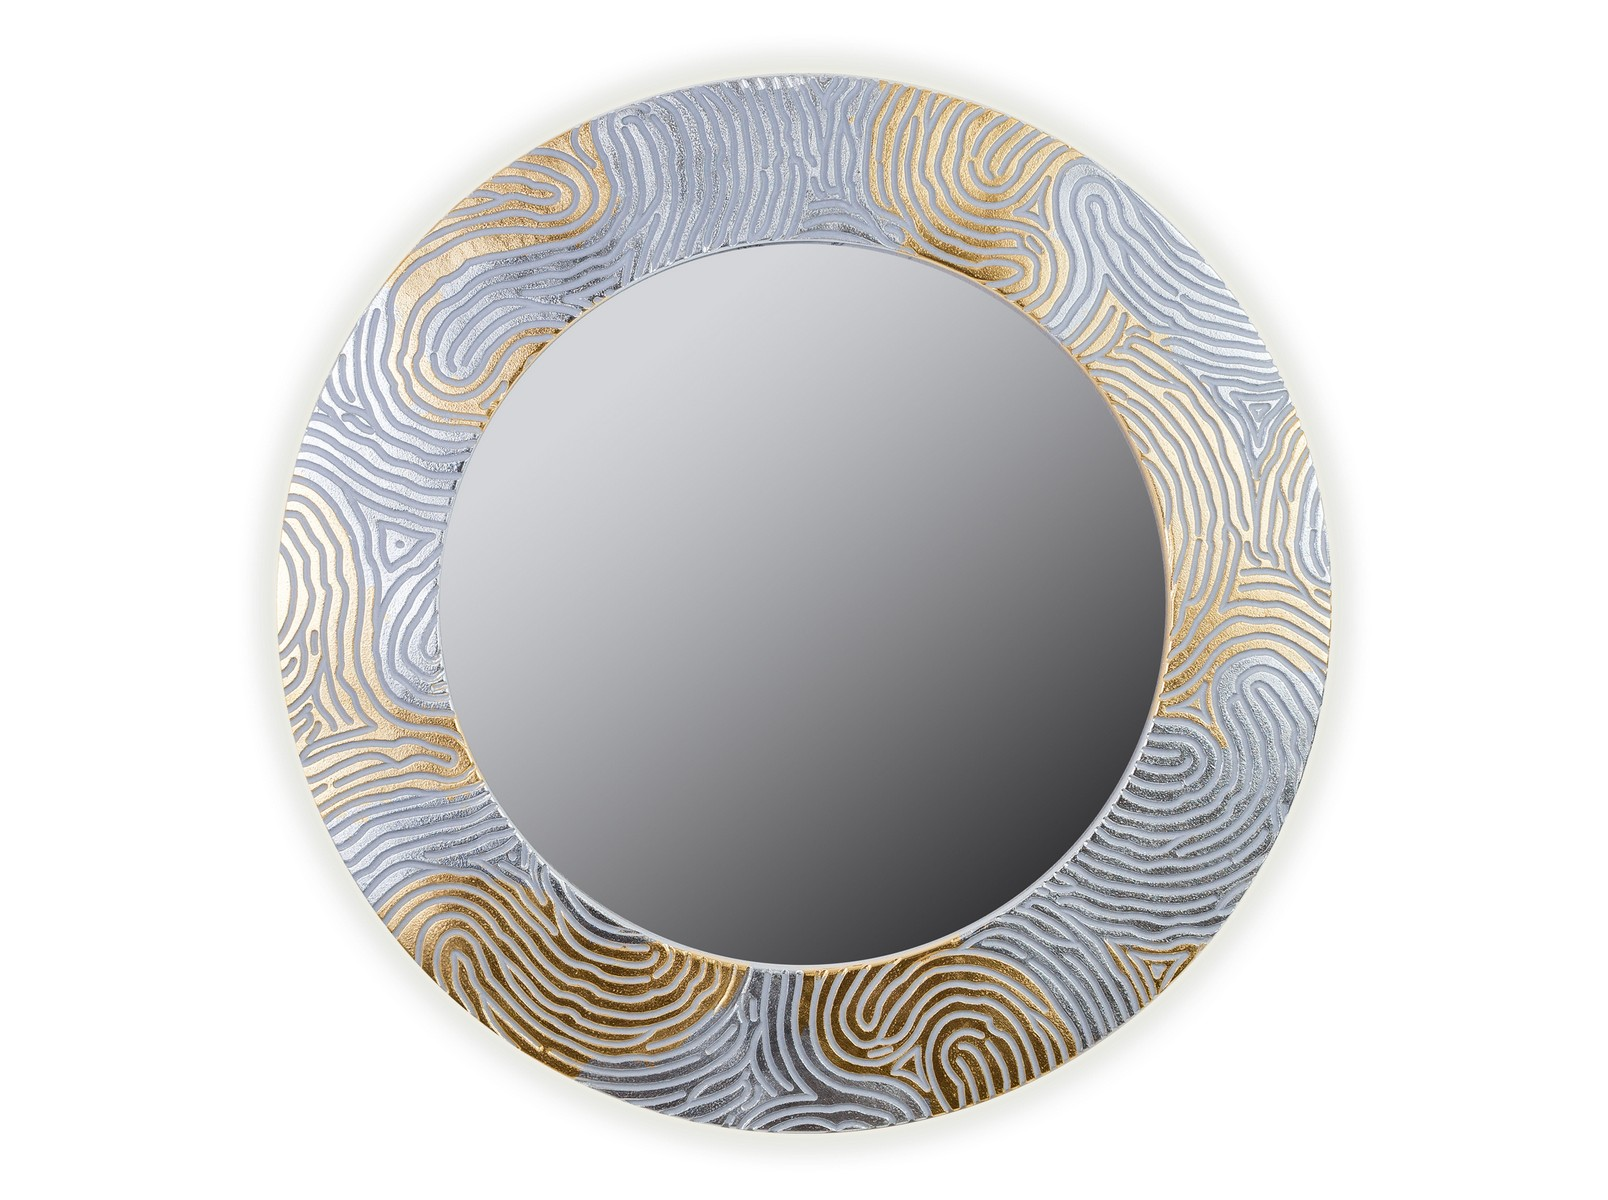 Зеркало FASHION MARKНастенные зеркала<br><br><br>Material: Дерево<br>Глубина см: 3